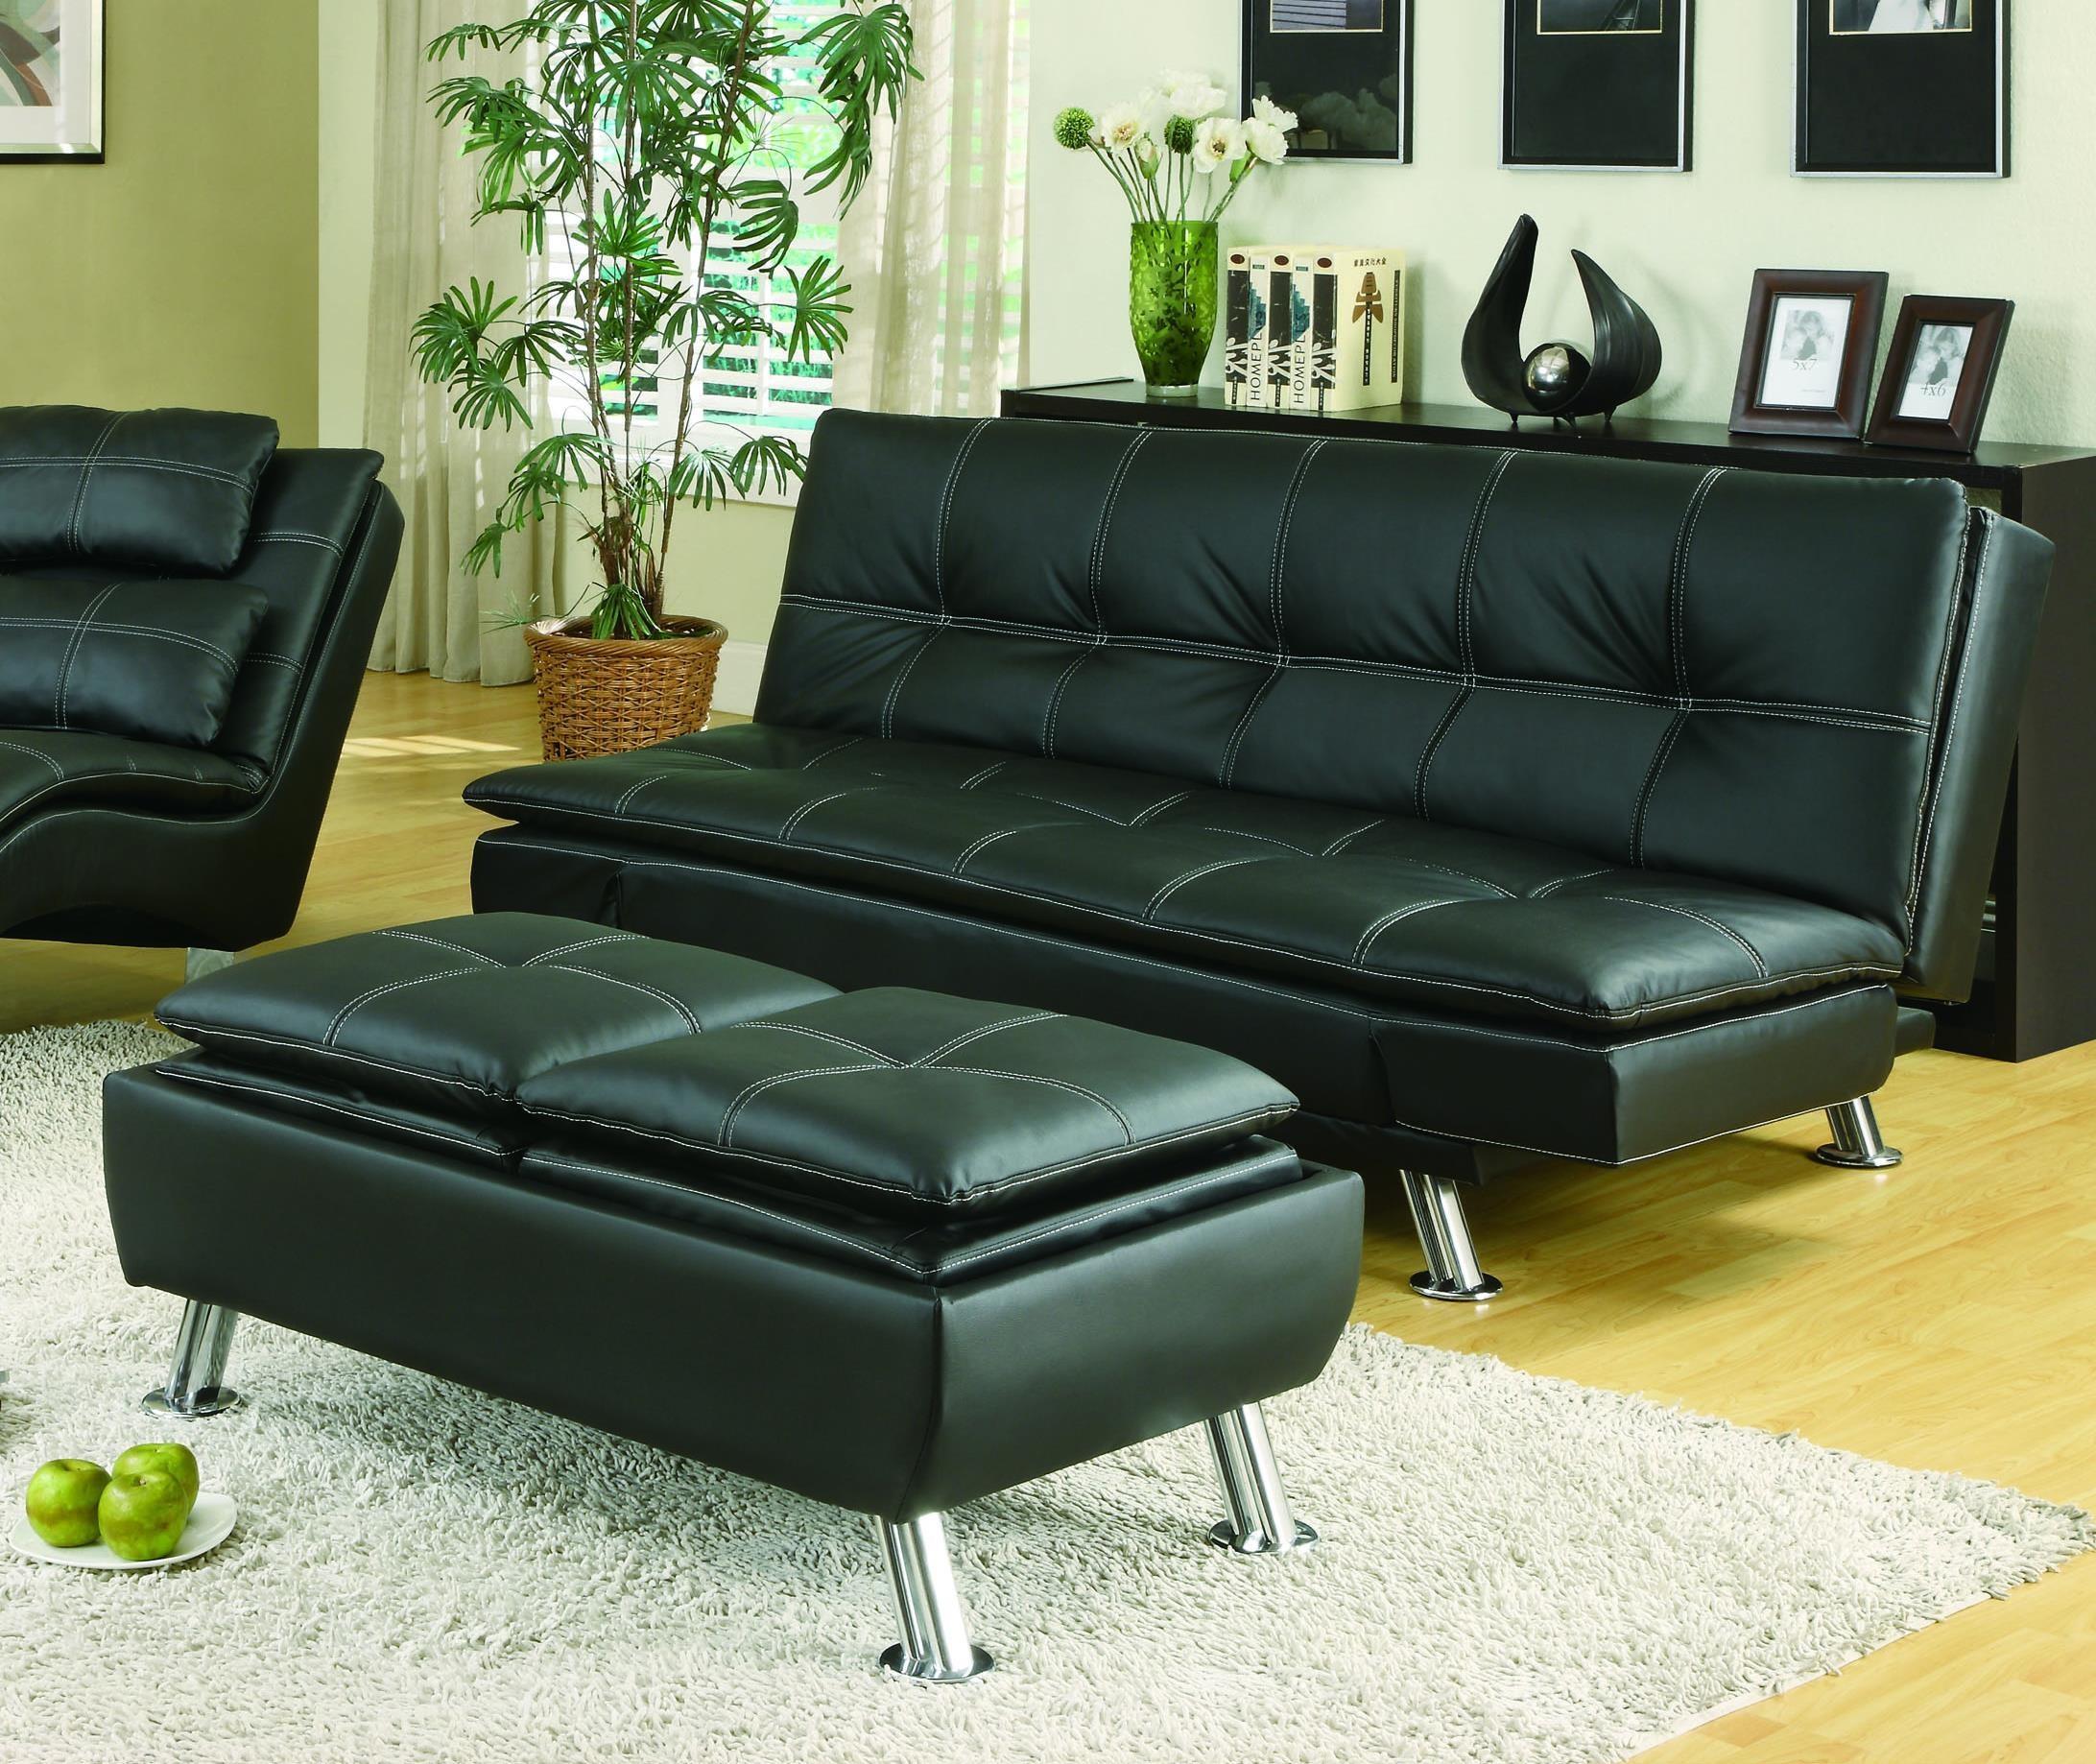 Groovy Sofa Beds And Futons Sofa Bed Ottoman Customarchery Wood Chair Design Ideas Customarcherynet